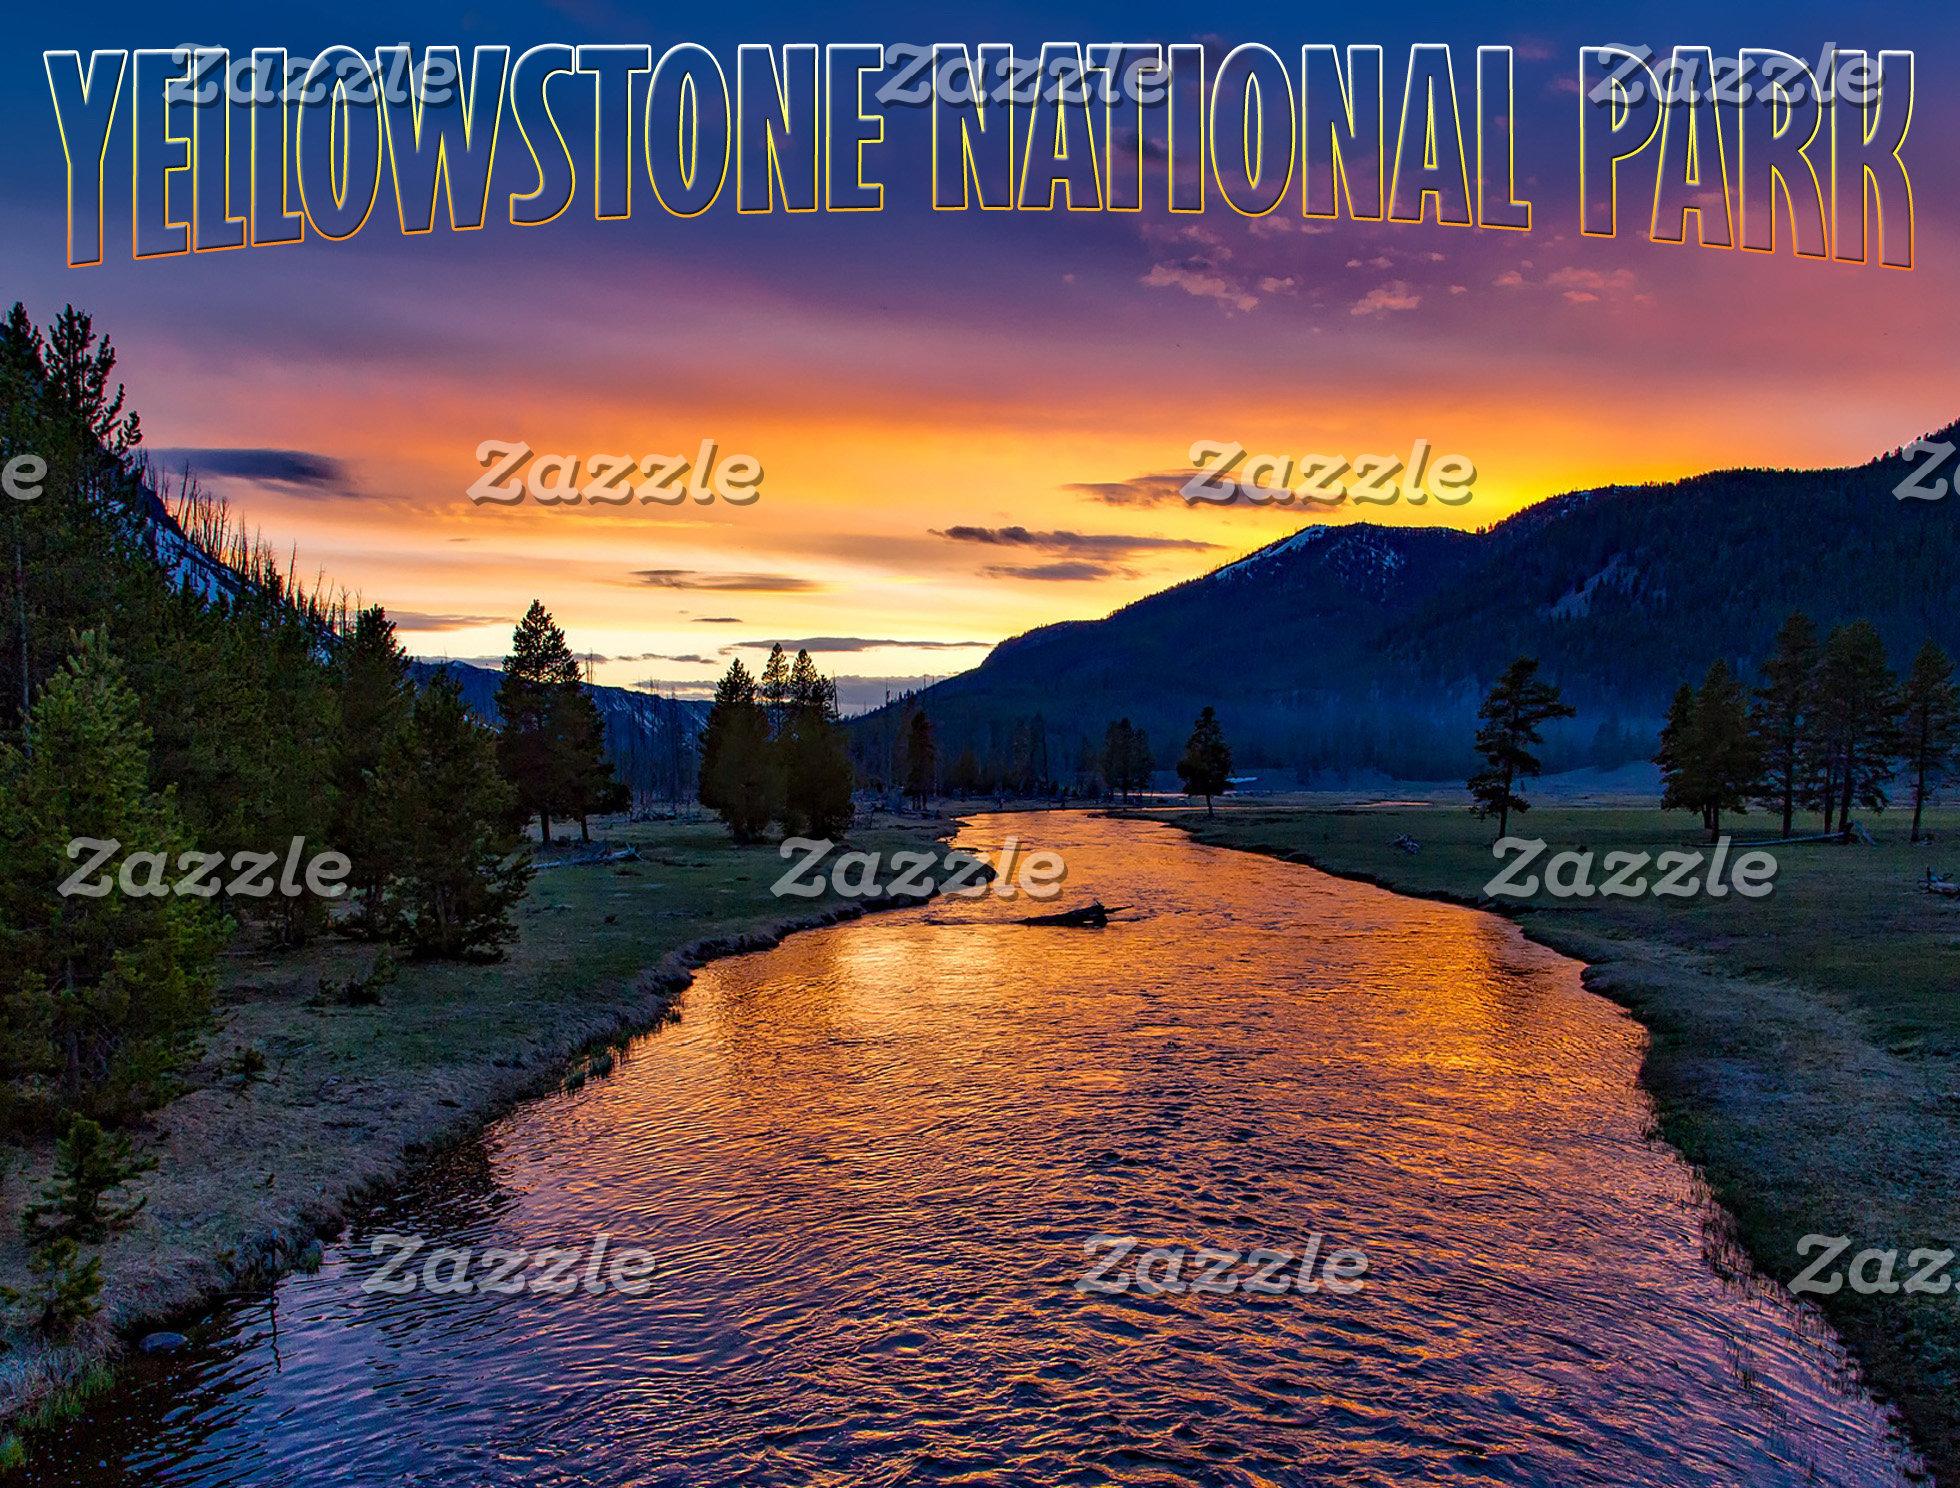 Yellowstone National Par, Wyoming (USA)